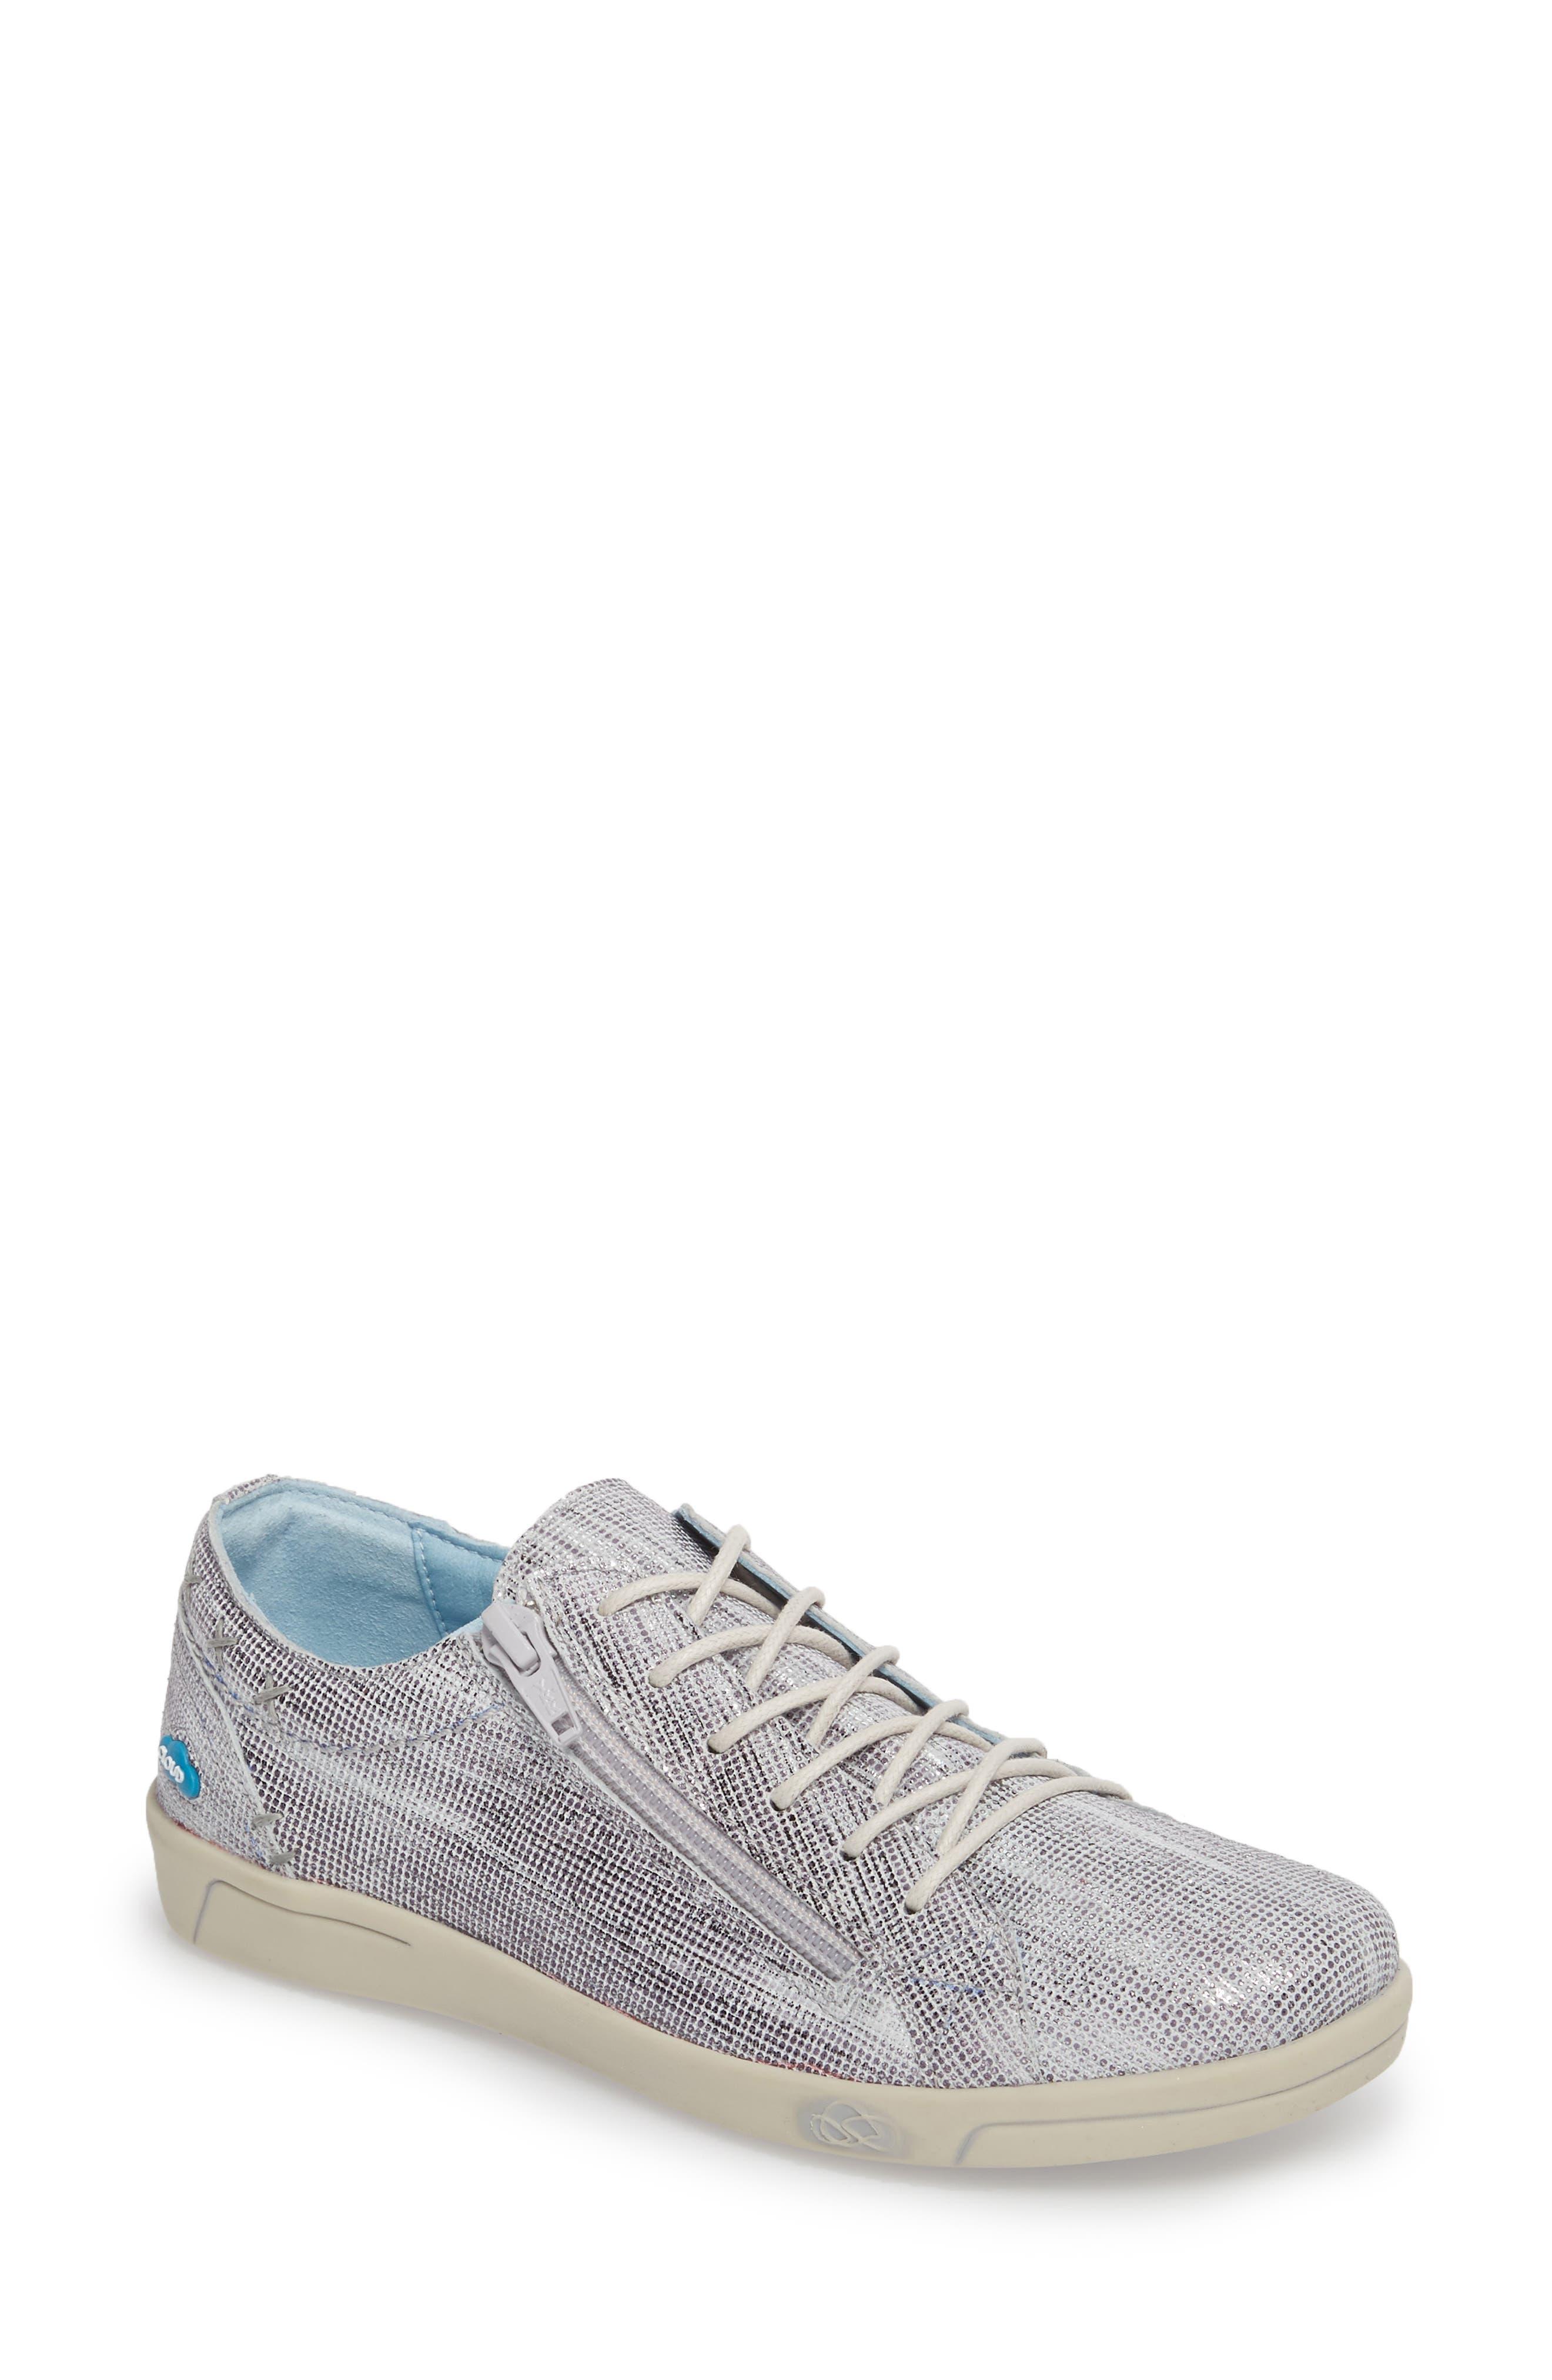 Aika Dunkan Sneaker,                             Main thumbnail 1, color,                             GREY LEATHER